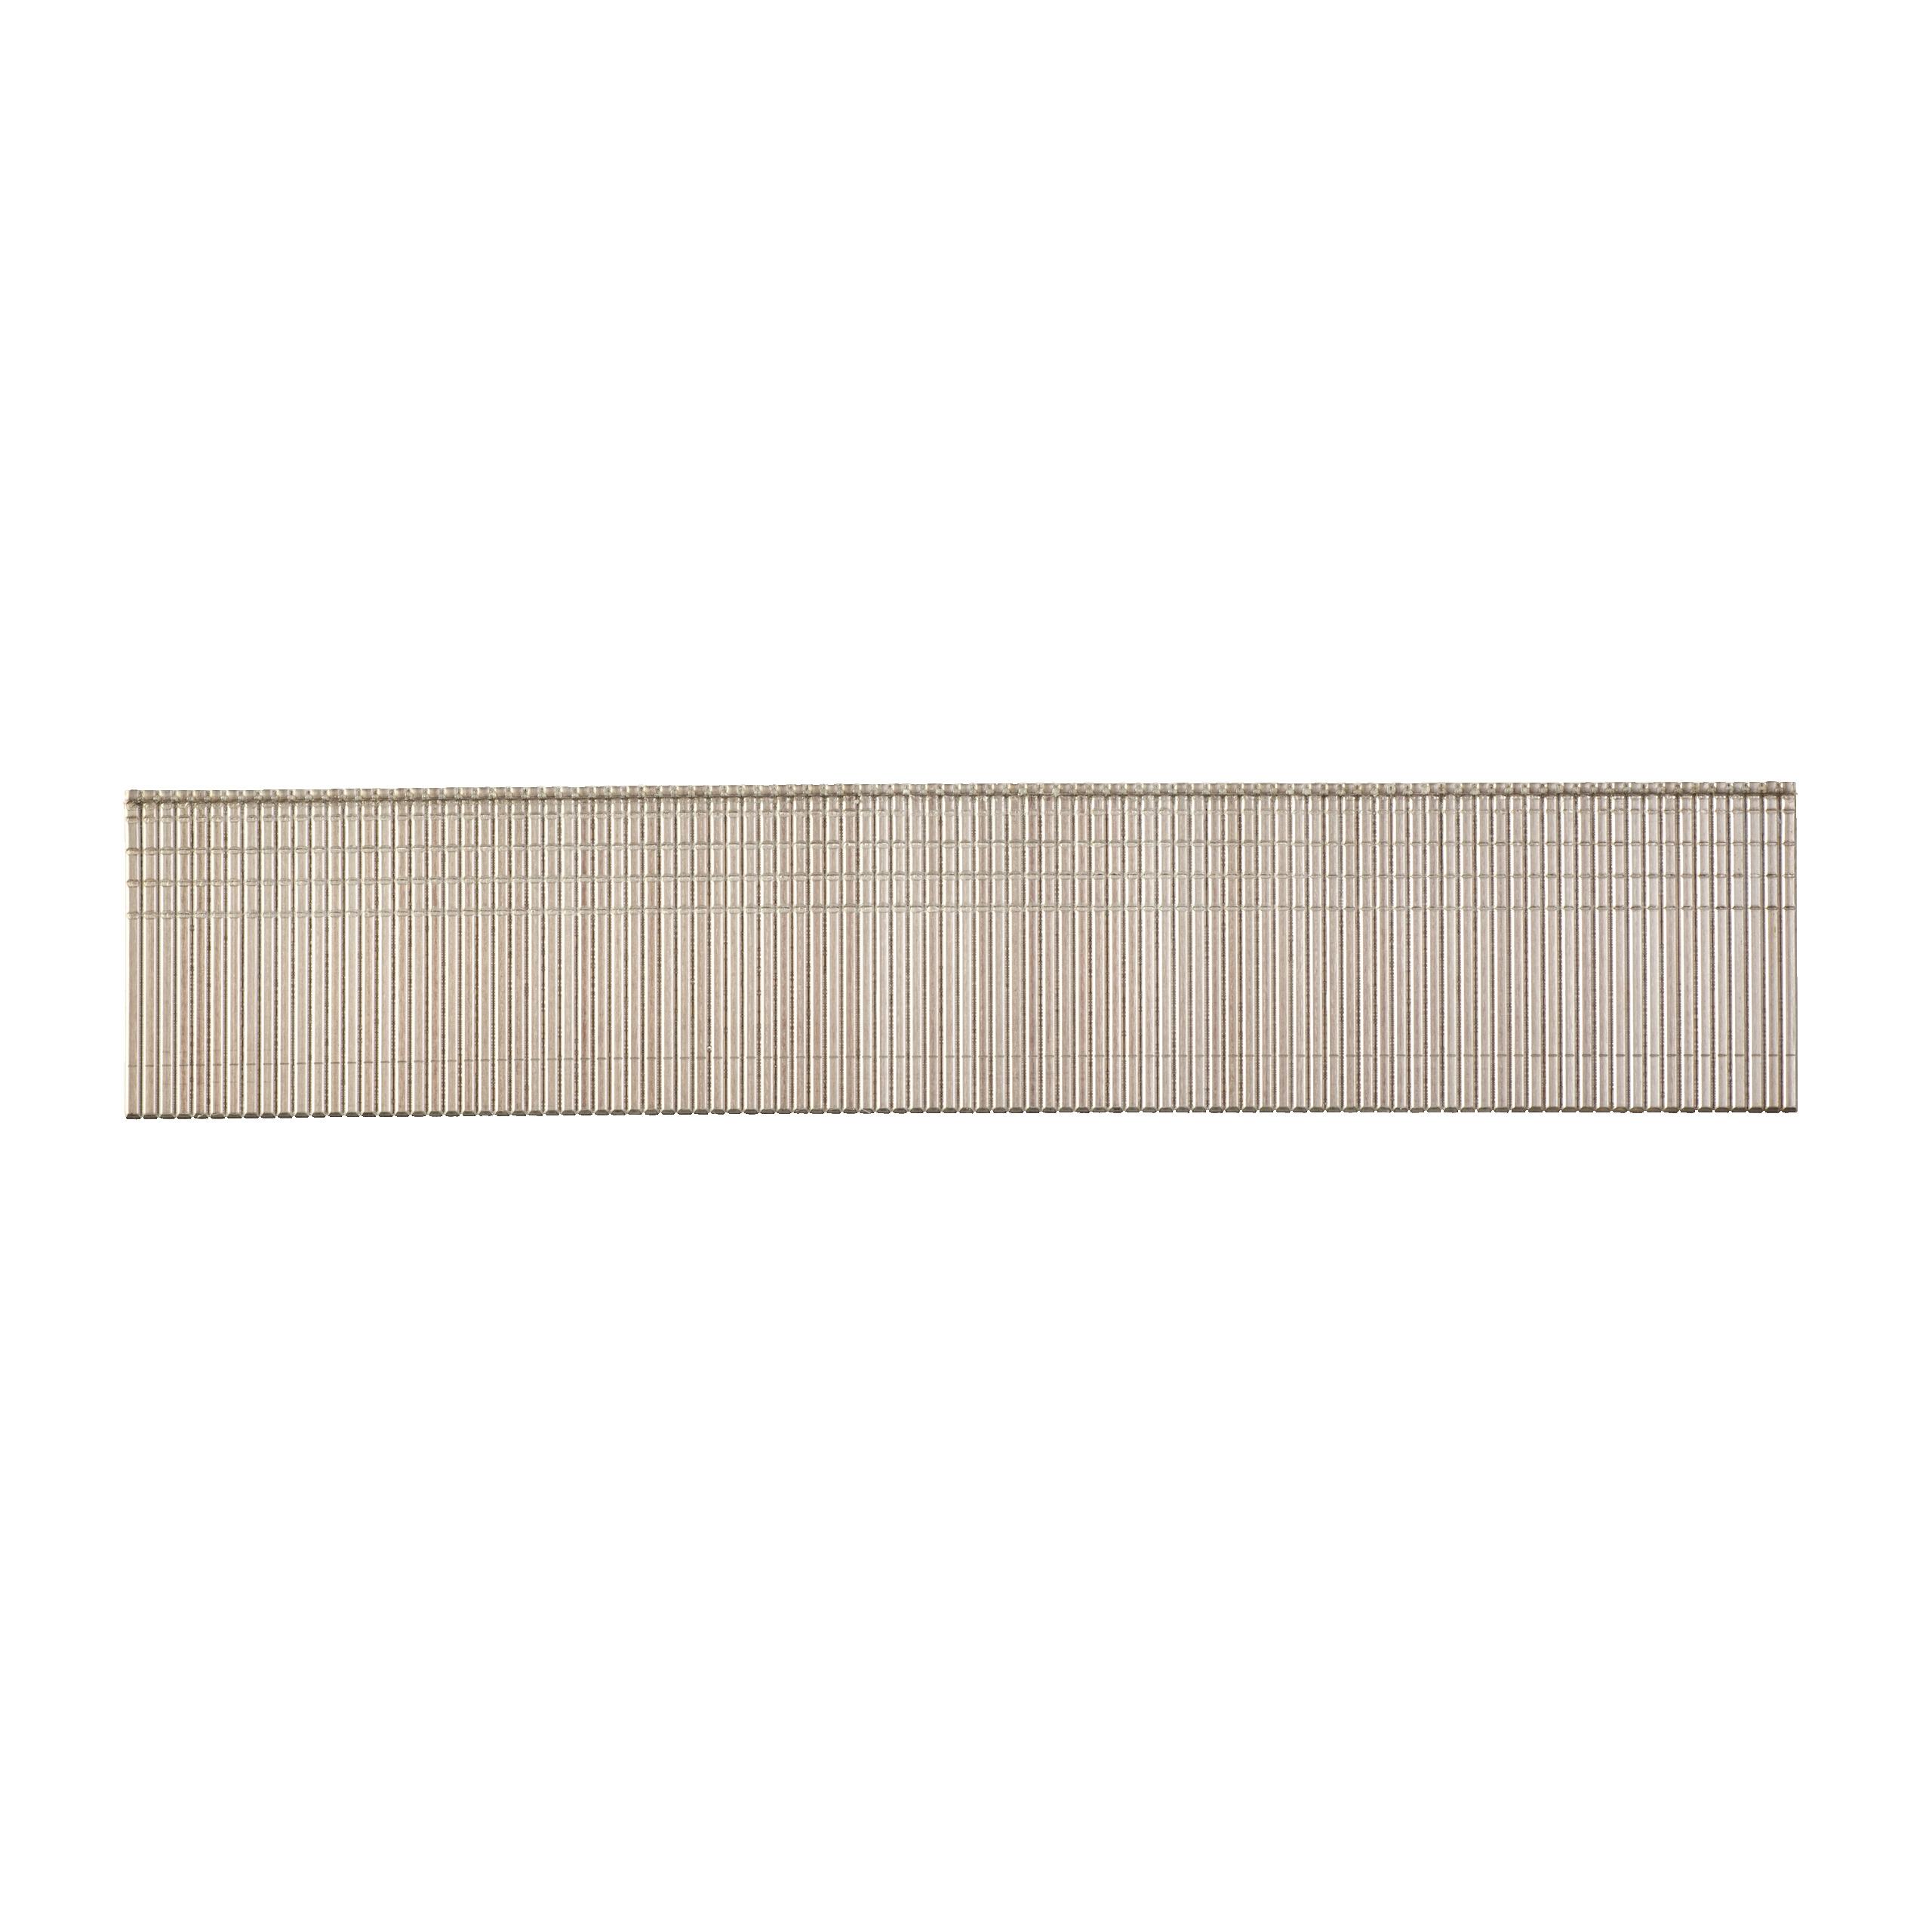 Hřebíky Inox 18G/25mm-5 tisíc ks